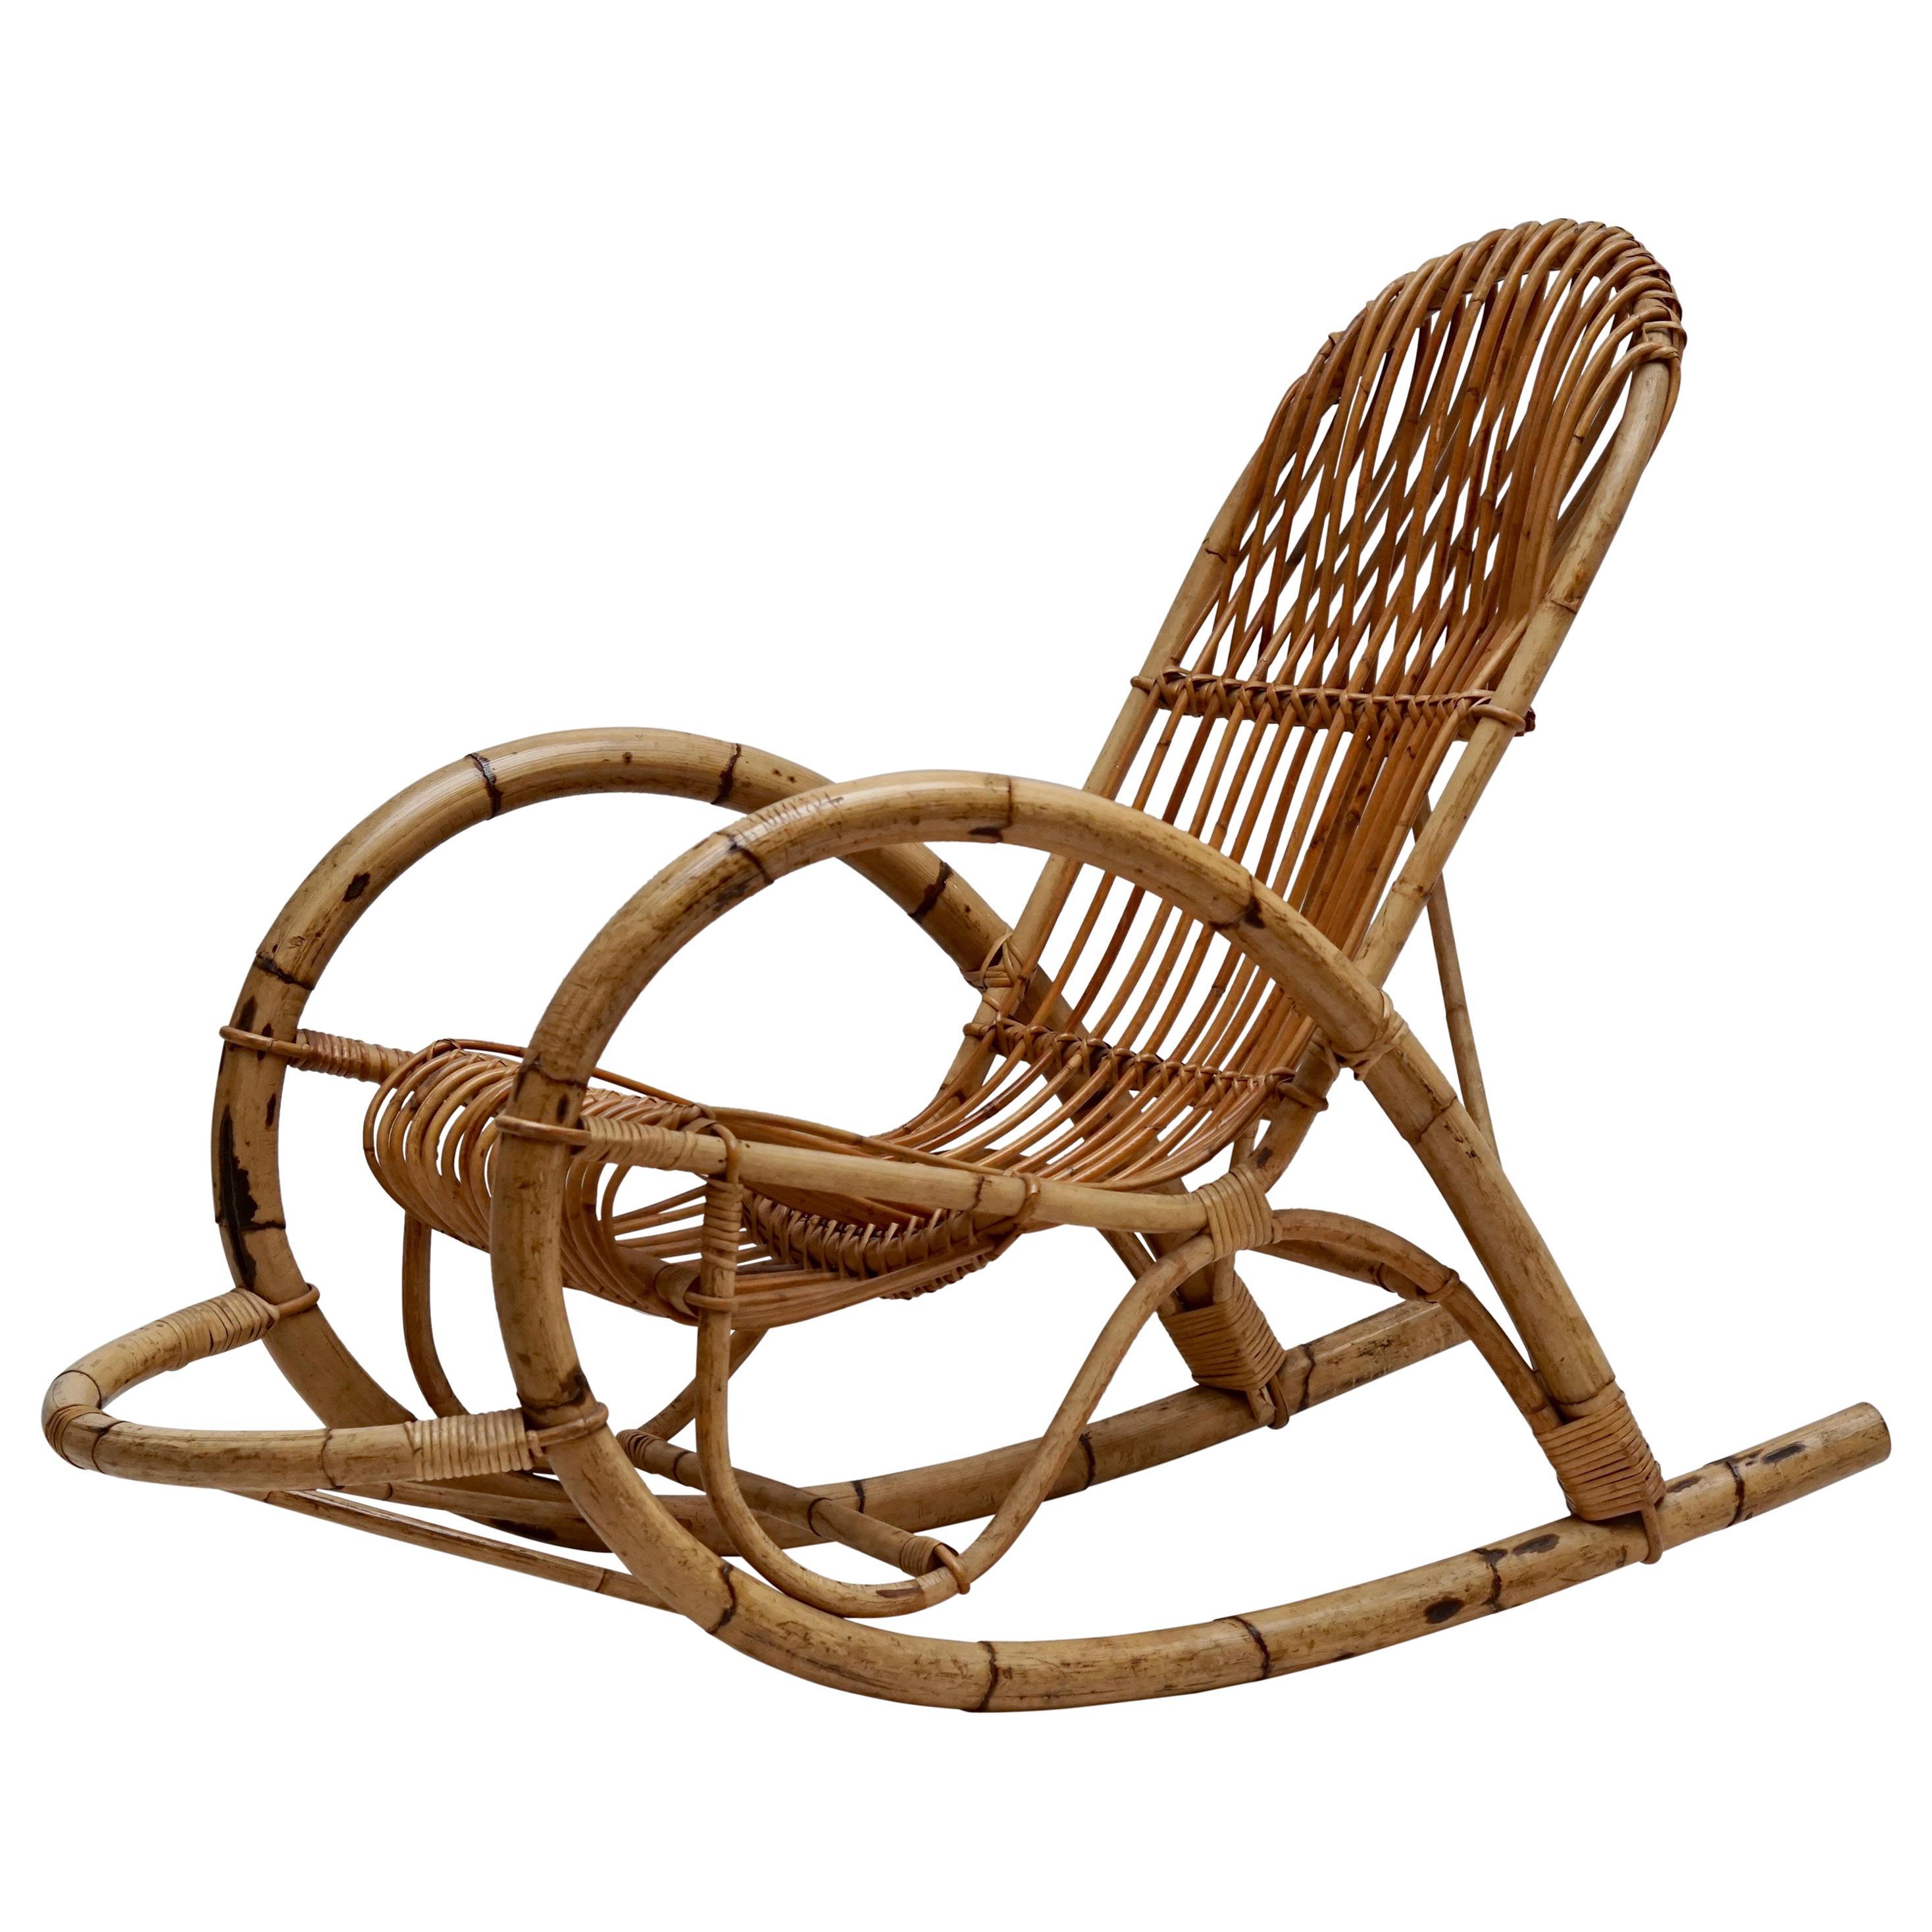 Franco Albini Style Wicker Bamboo Rocking Chair